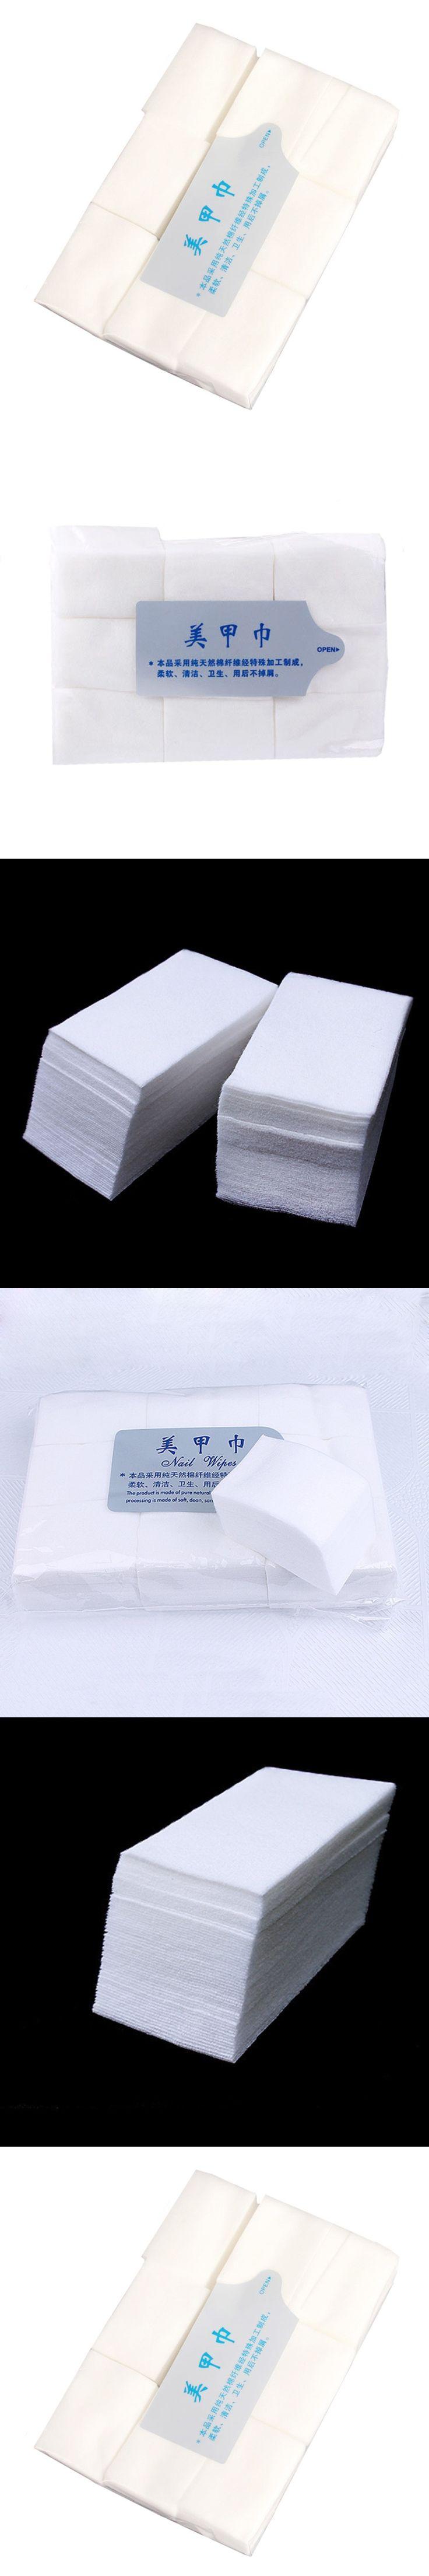 900PCS Nail Tools Bath Manicure Gel Nail Polish Remover Lint-Free Wipes Cotton Napkins For Nails